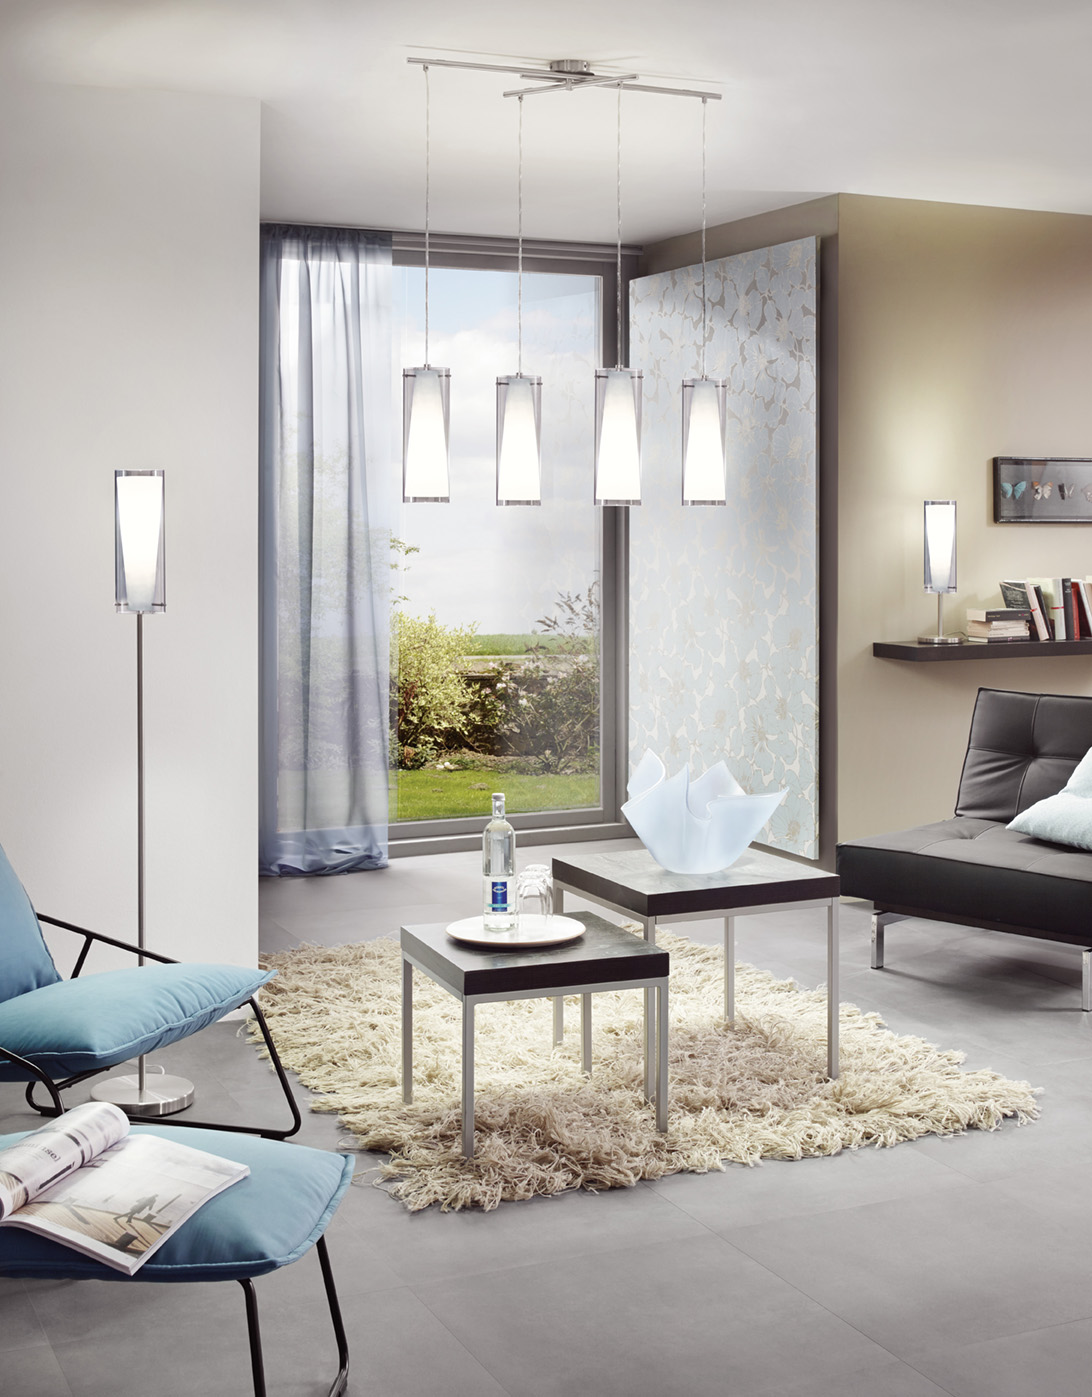 z v sn sv tidlo pinto nero eglo 90305 eglo sv tidla. Black Bedroom Furniture Sets. Home Design Ideas